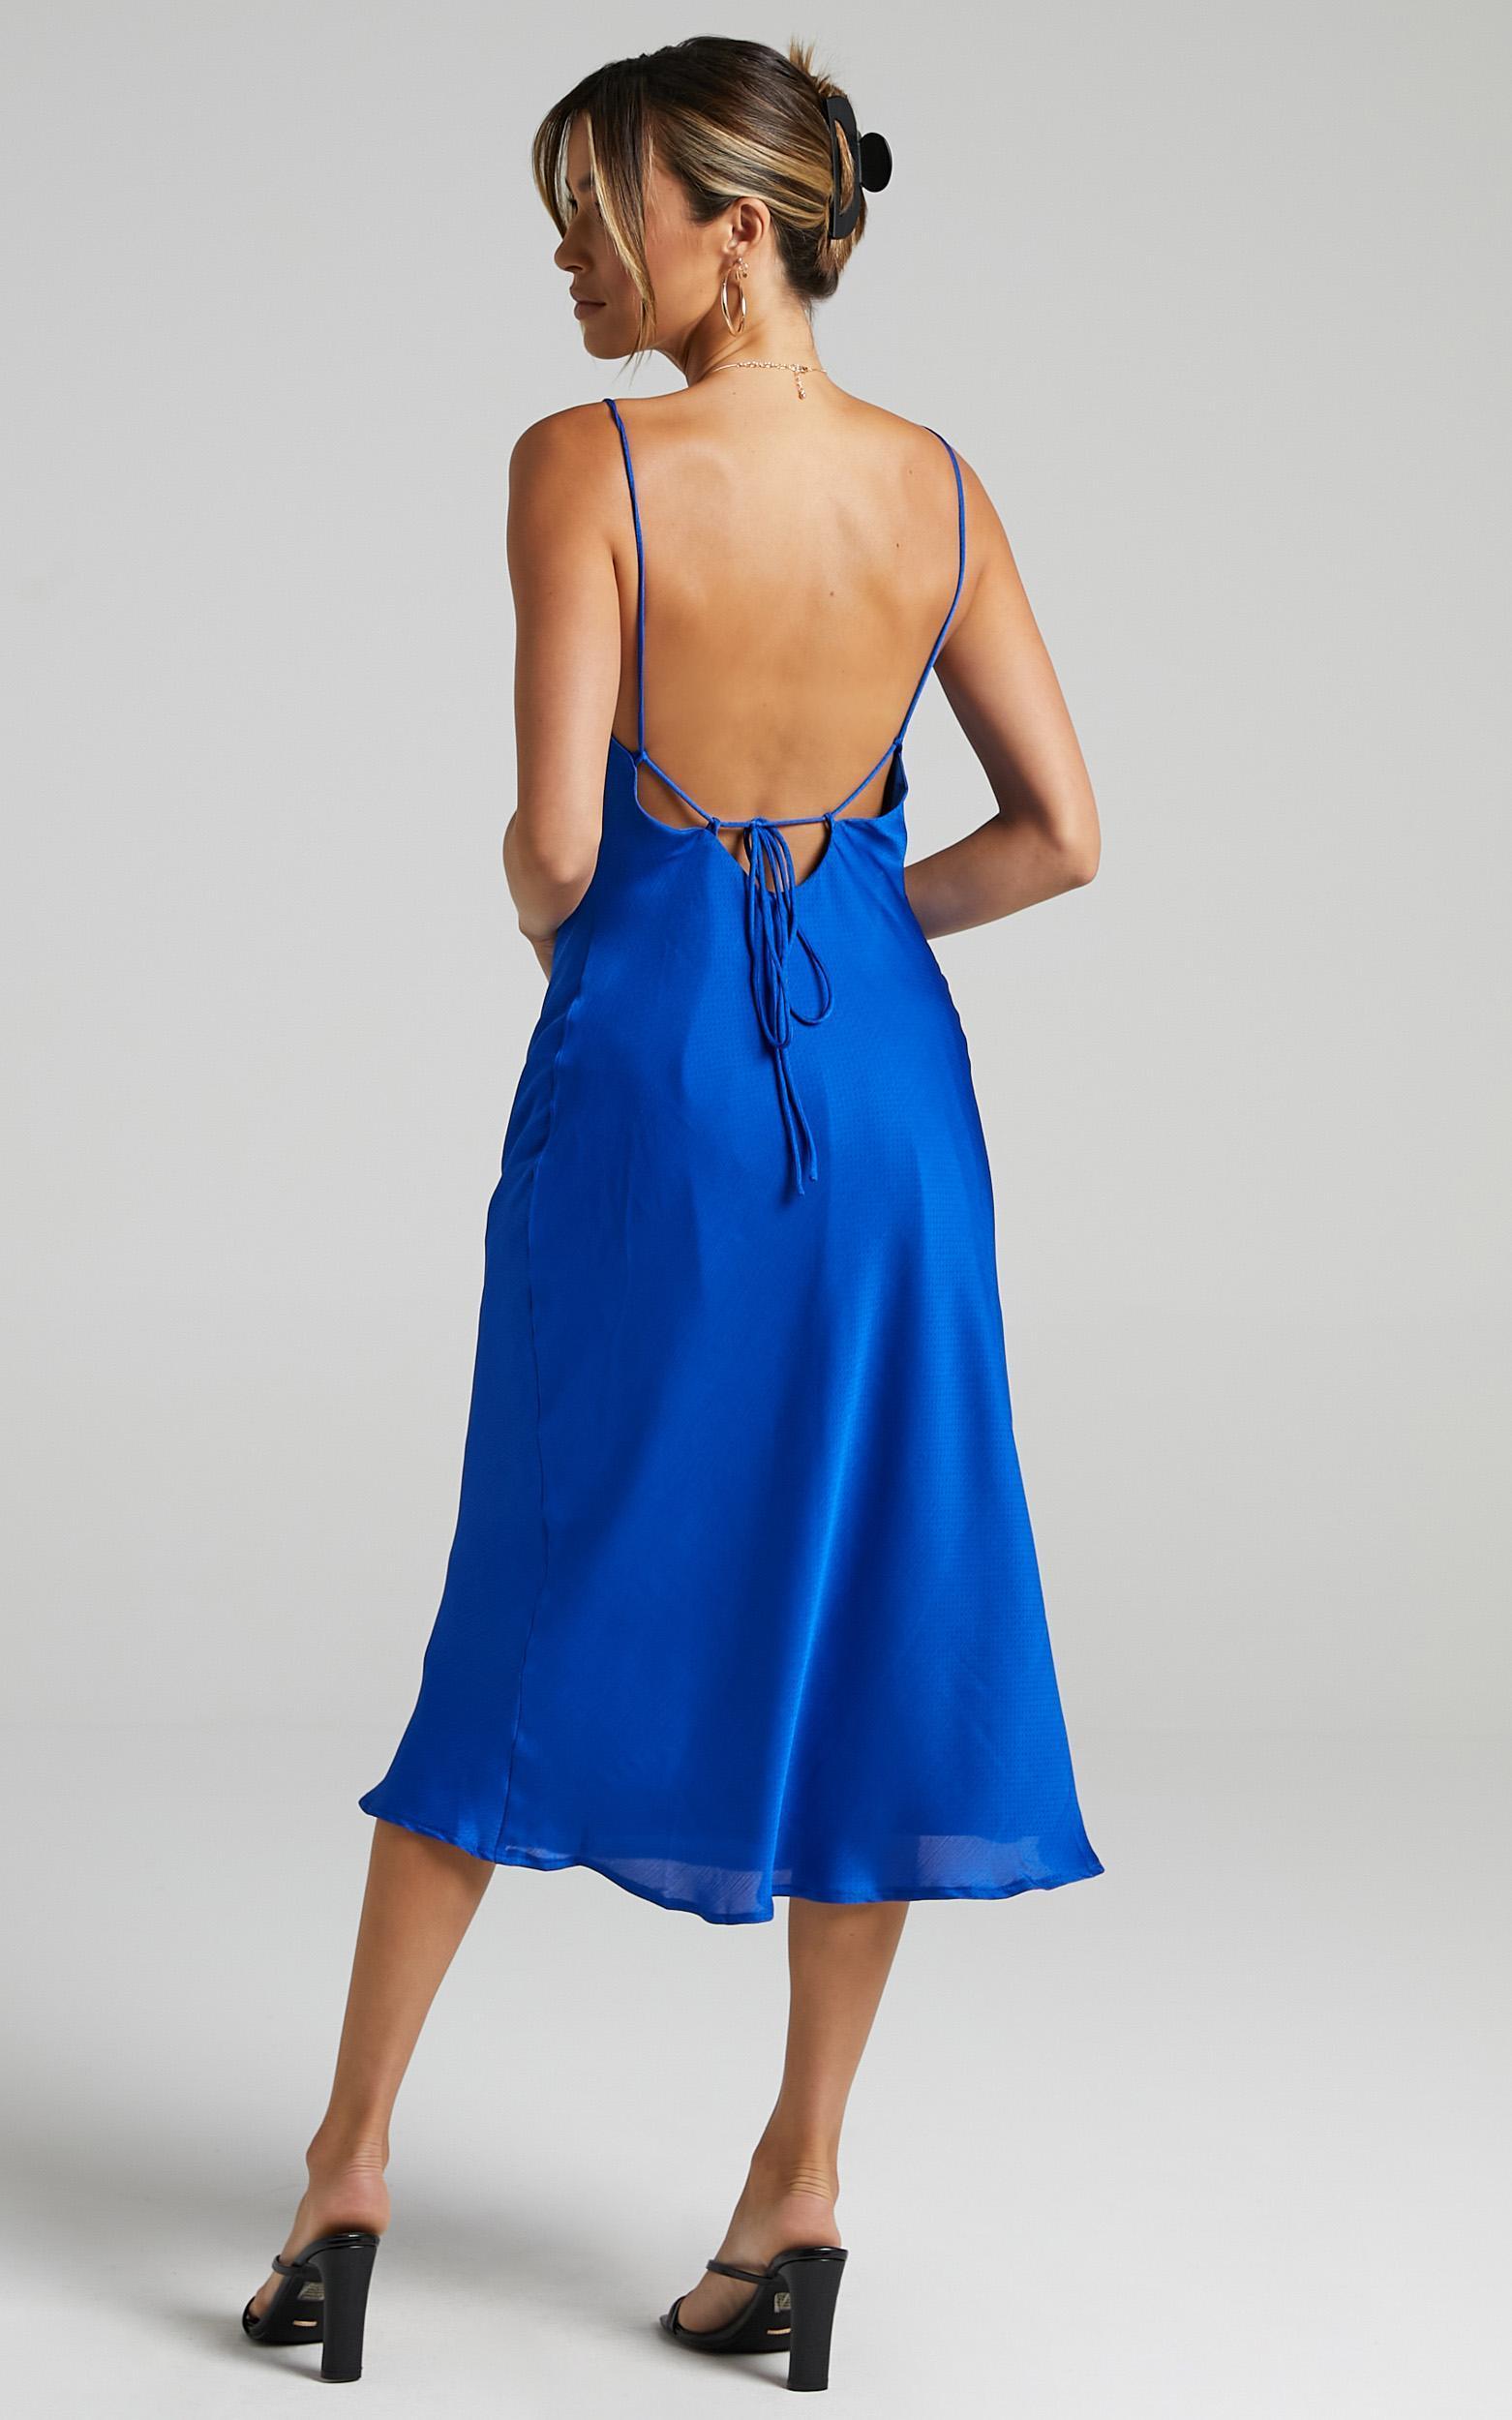 Malmuira Dress in Cobalt Satin - 6 (XS), Blue, hi-res image number null